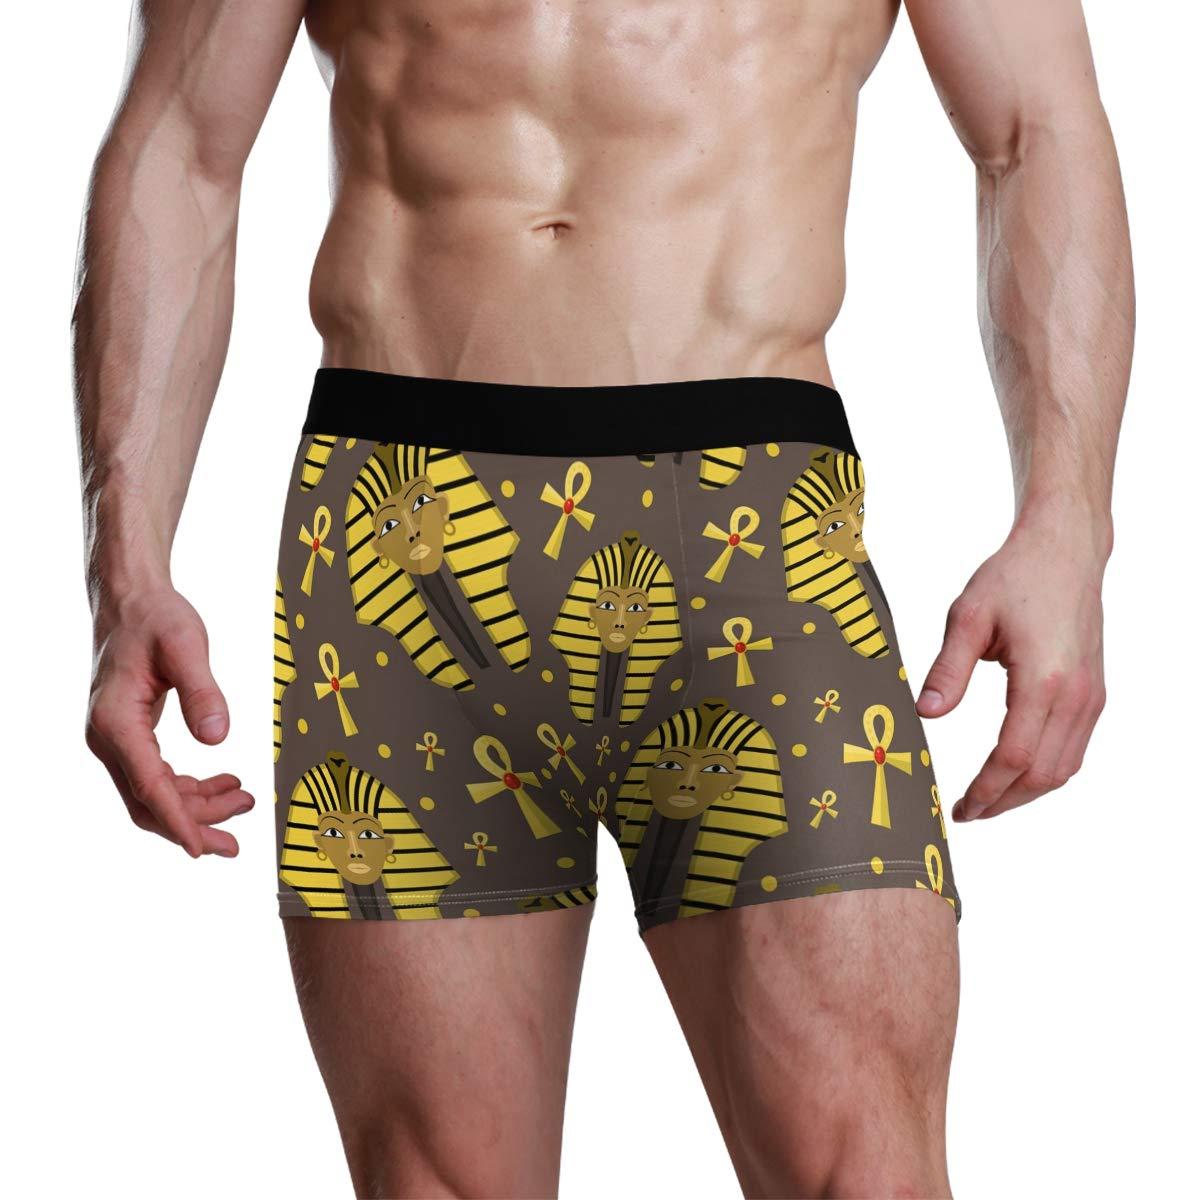 UNISE Pharaoh Exotic Boxer Briefs Comfortable Soft Underwear Boyshorts Underwear for Men